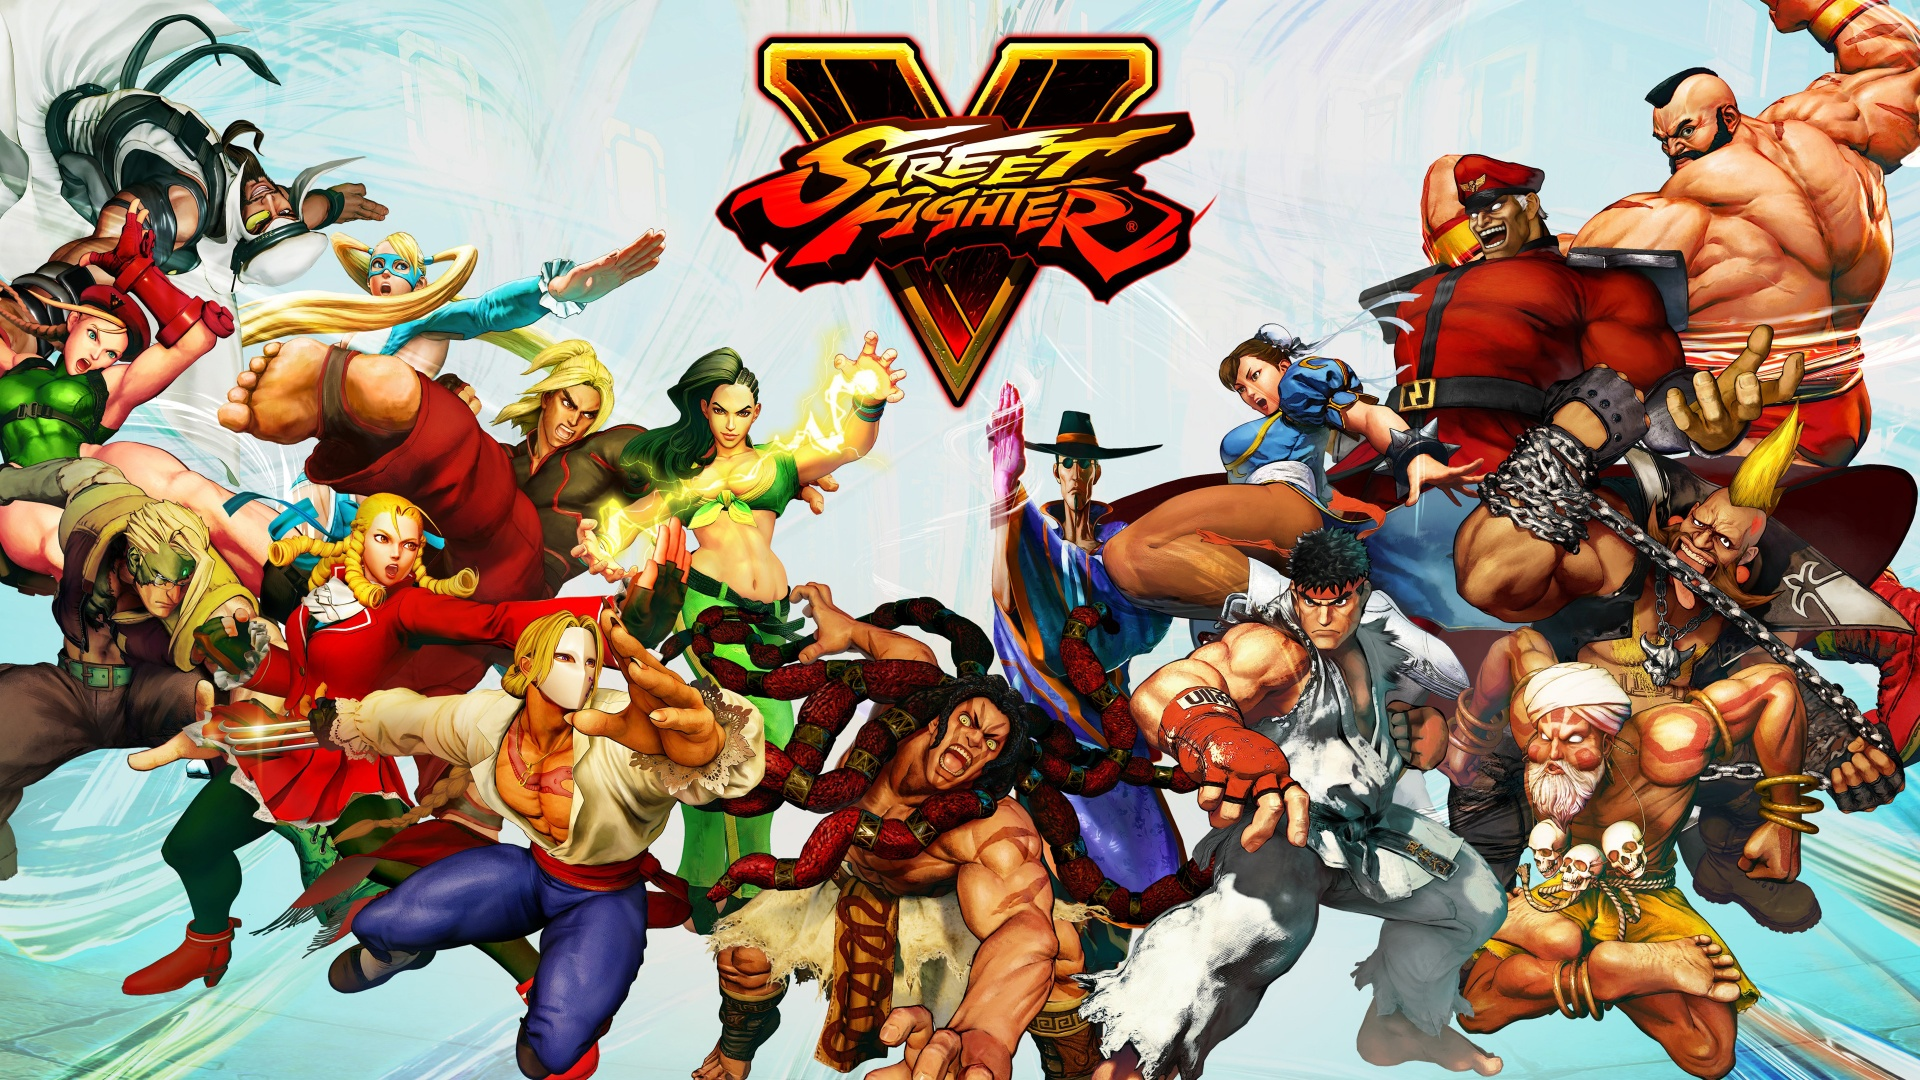 Street Fighter Hd Wallpaper Wallpapersafari